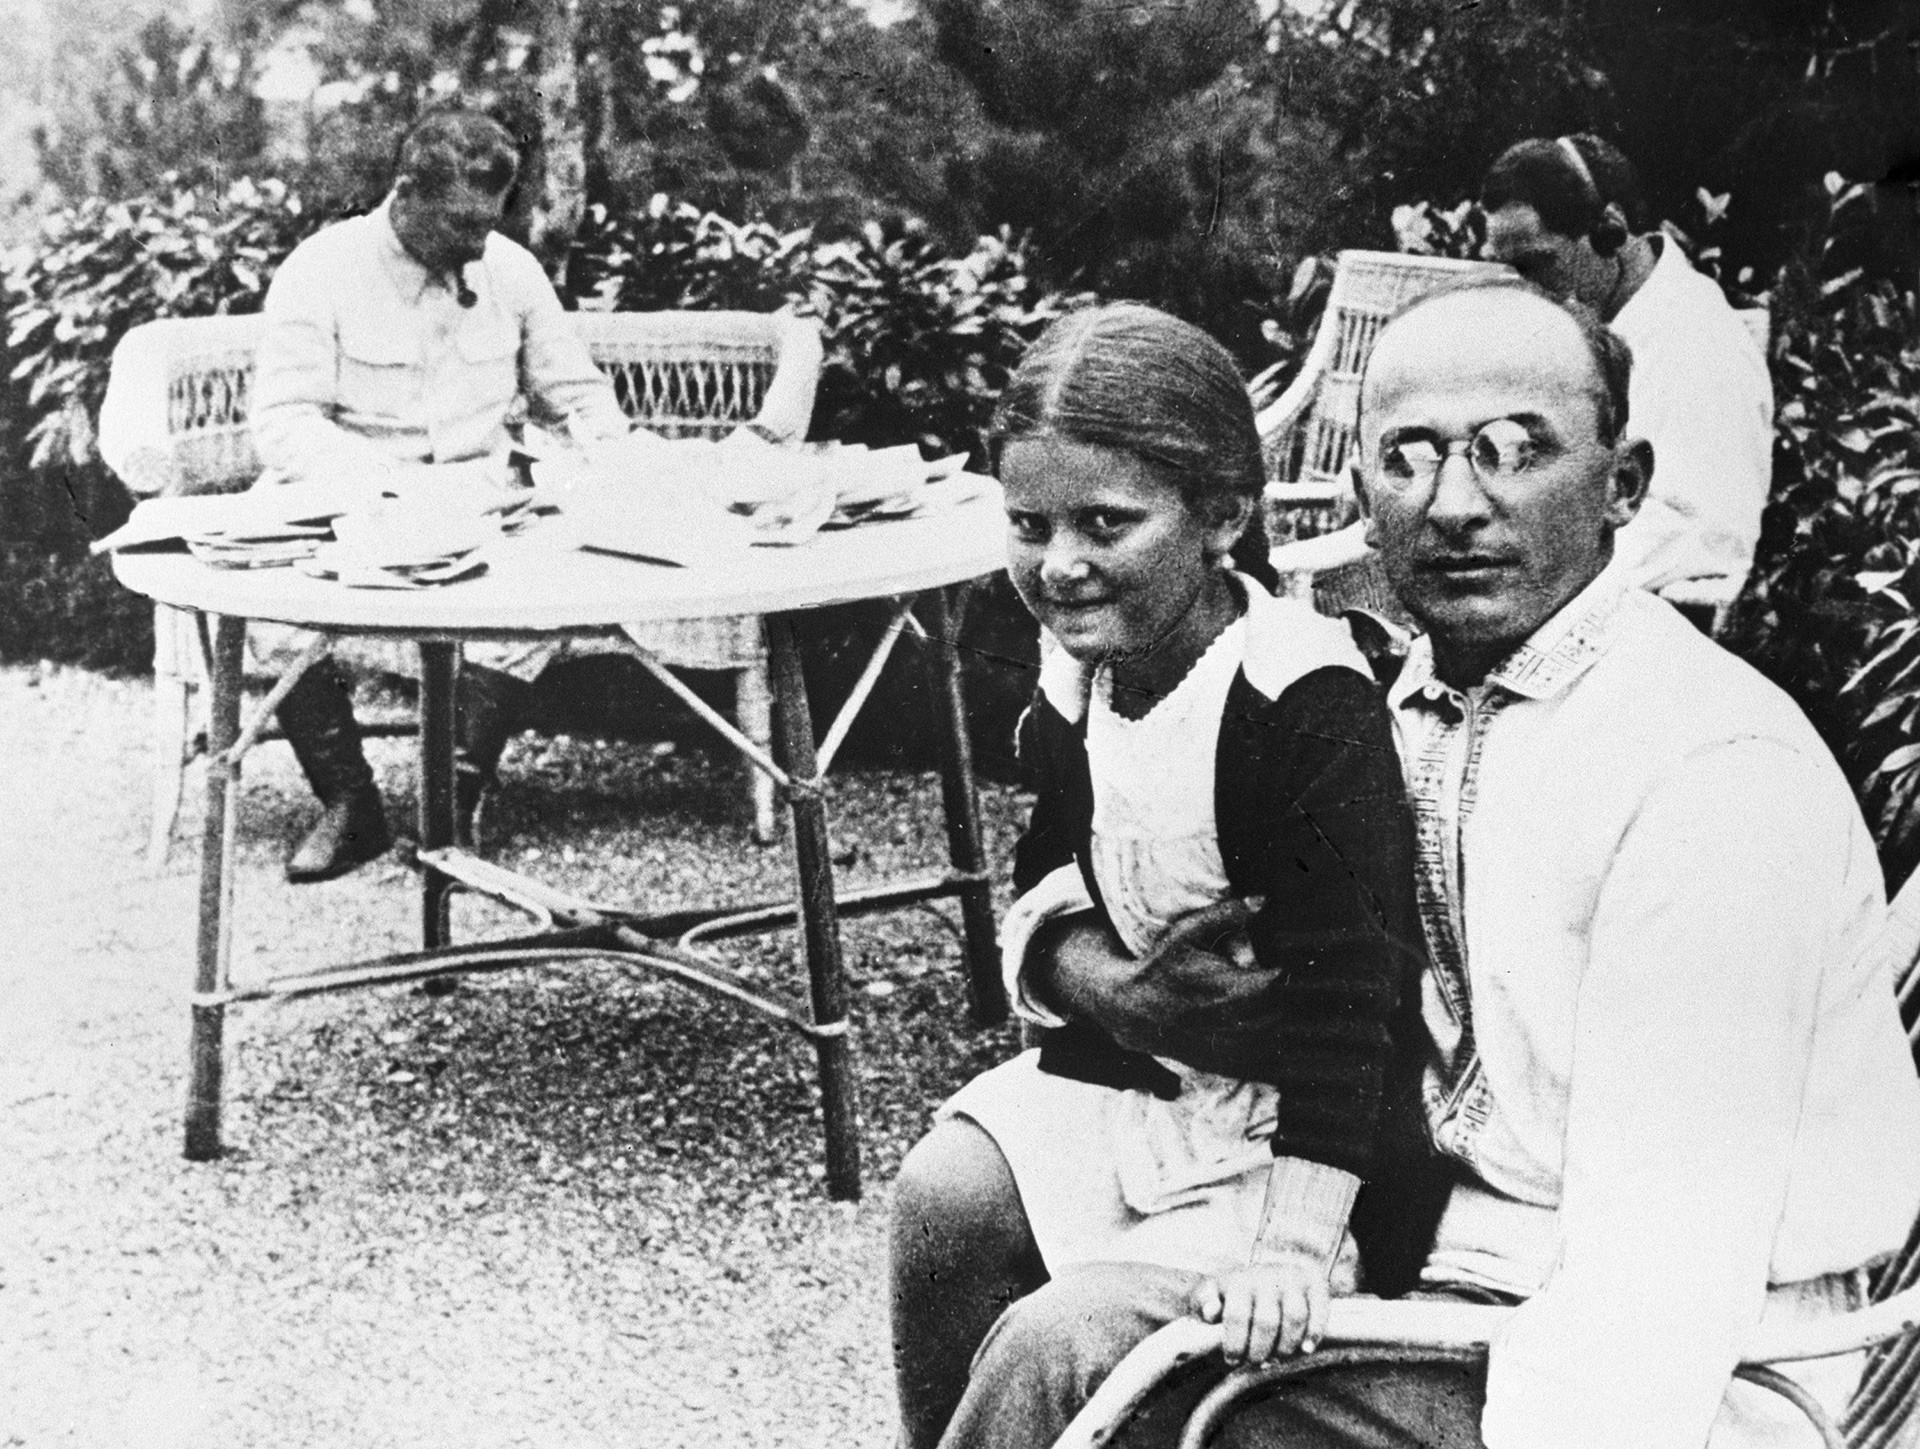 Lavrenti Beria, jefe de la policía secreta NKVD entre 1938 y 1945, con Iósif Stalin y su hija Svetalana.